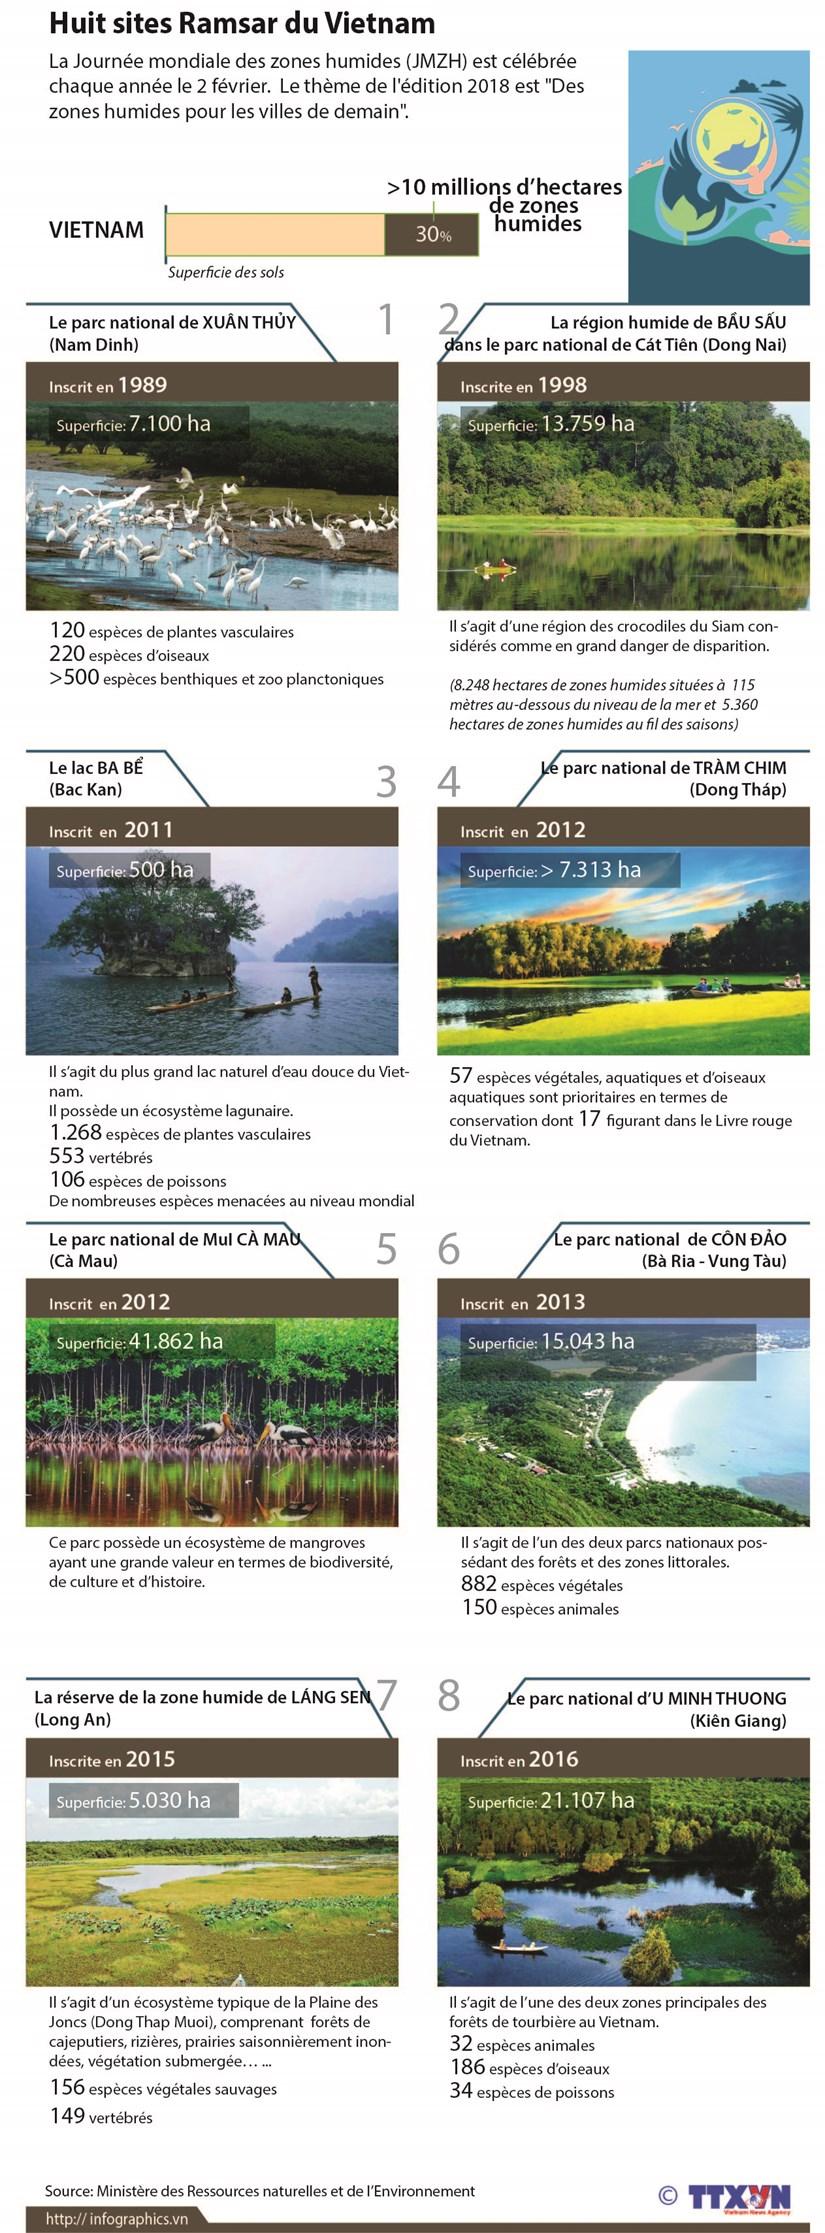 Huit sites Ramsar du Vietnam hinh anh 1